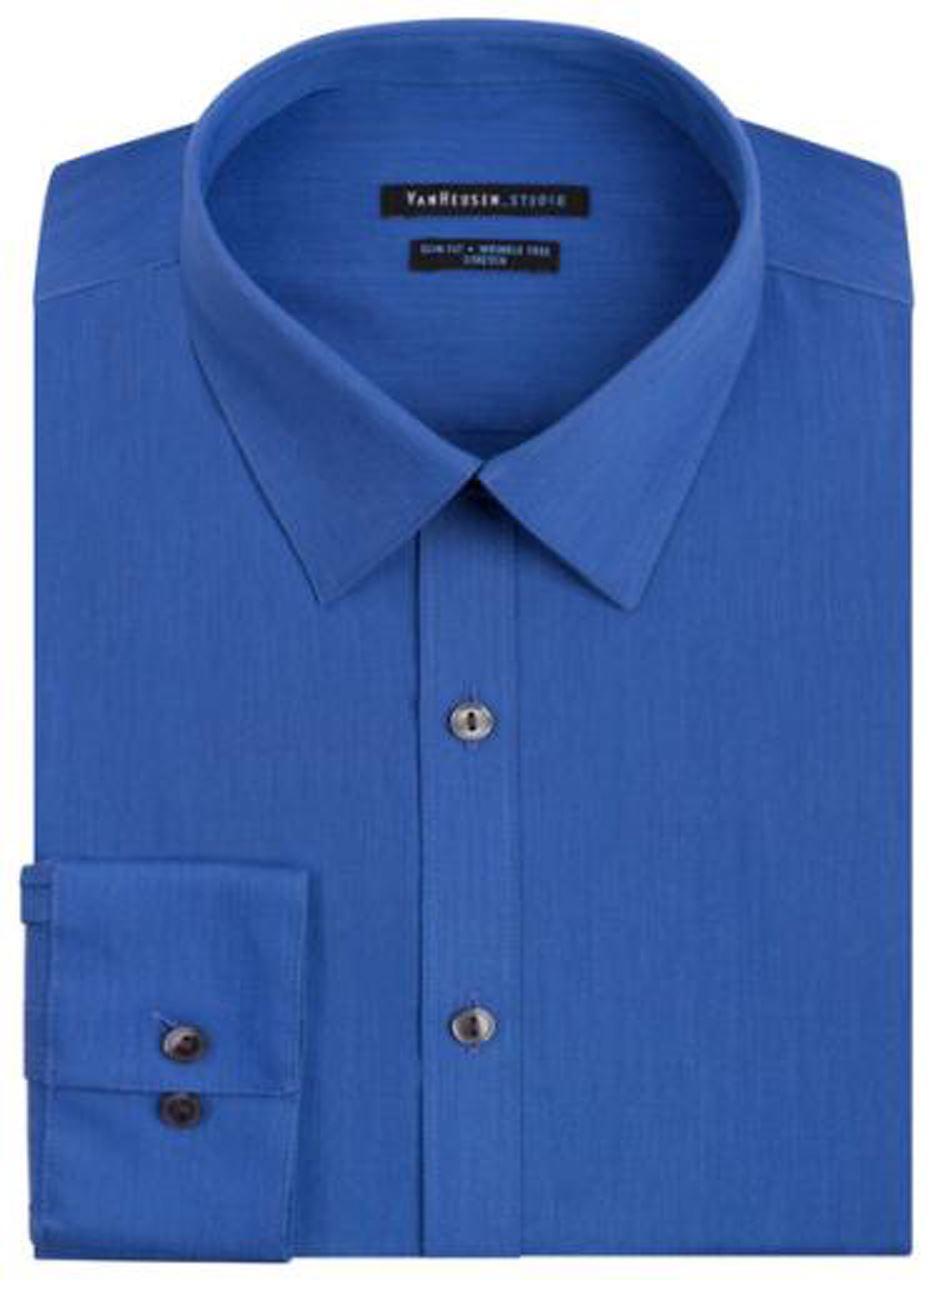 Mens-Shirt-Van-Heusen-Slim-Fit-Cotton-Blend-